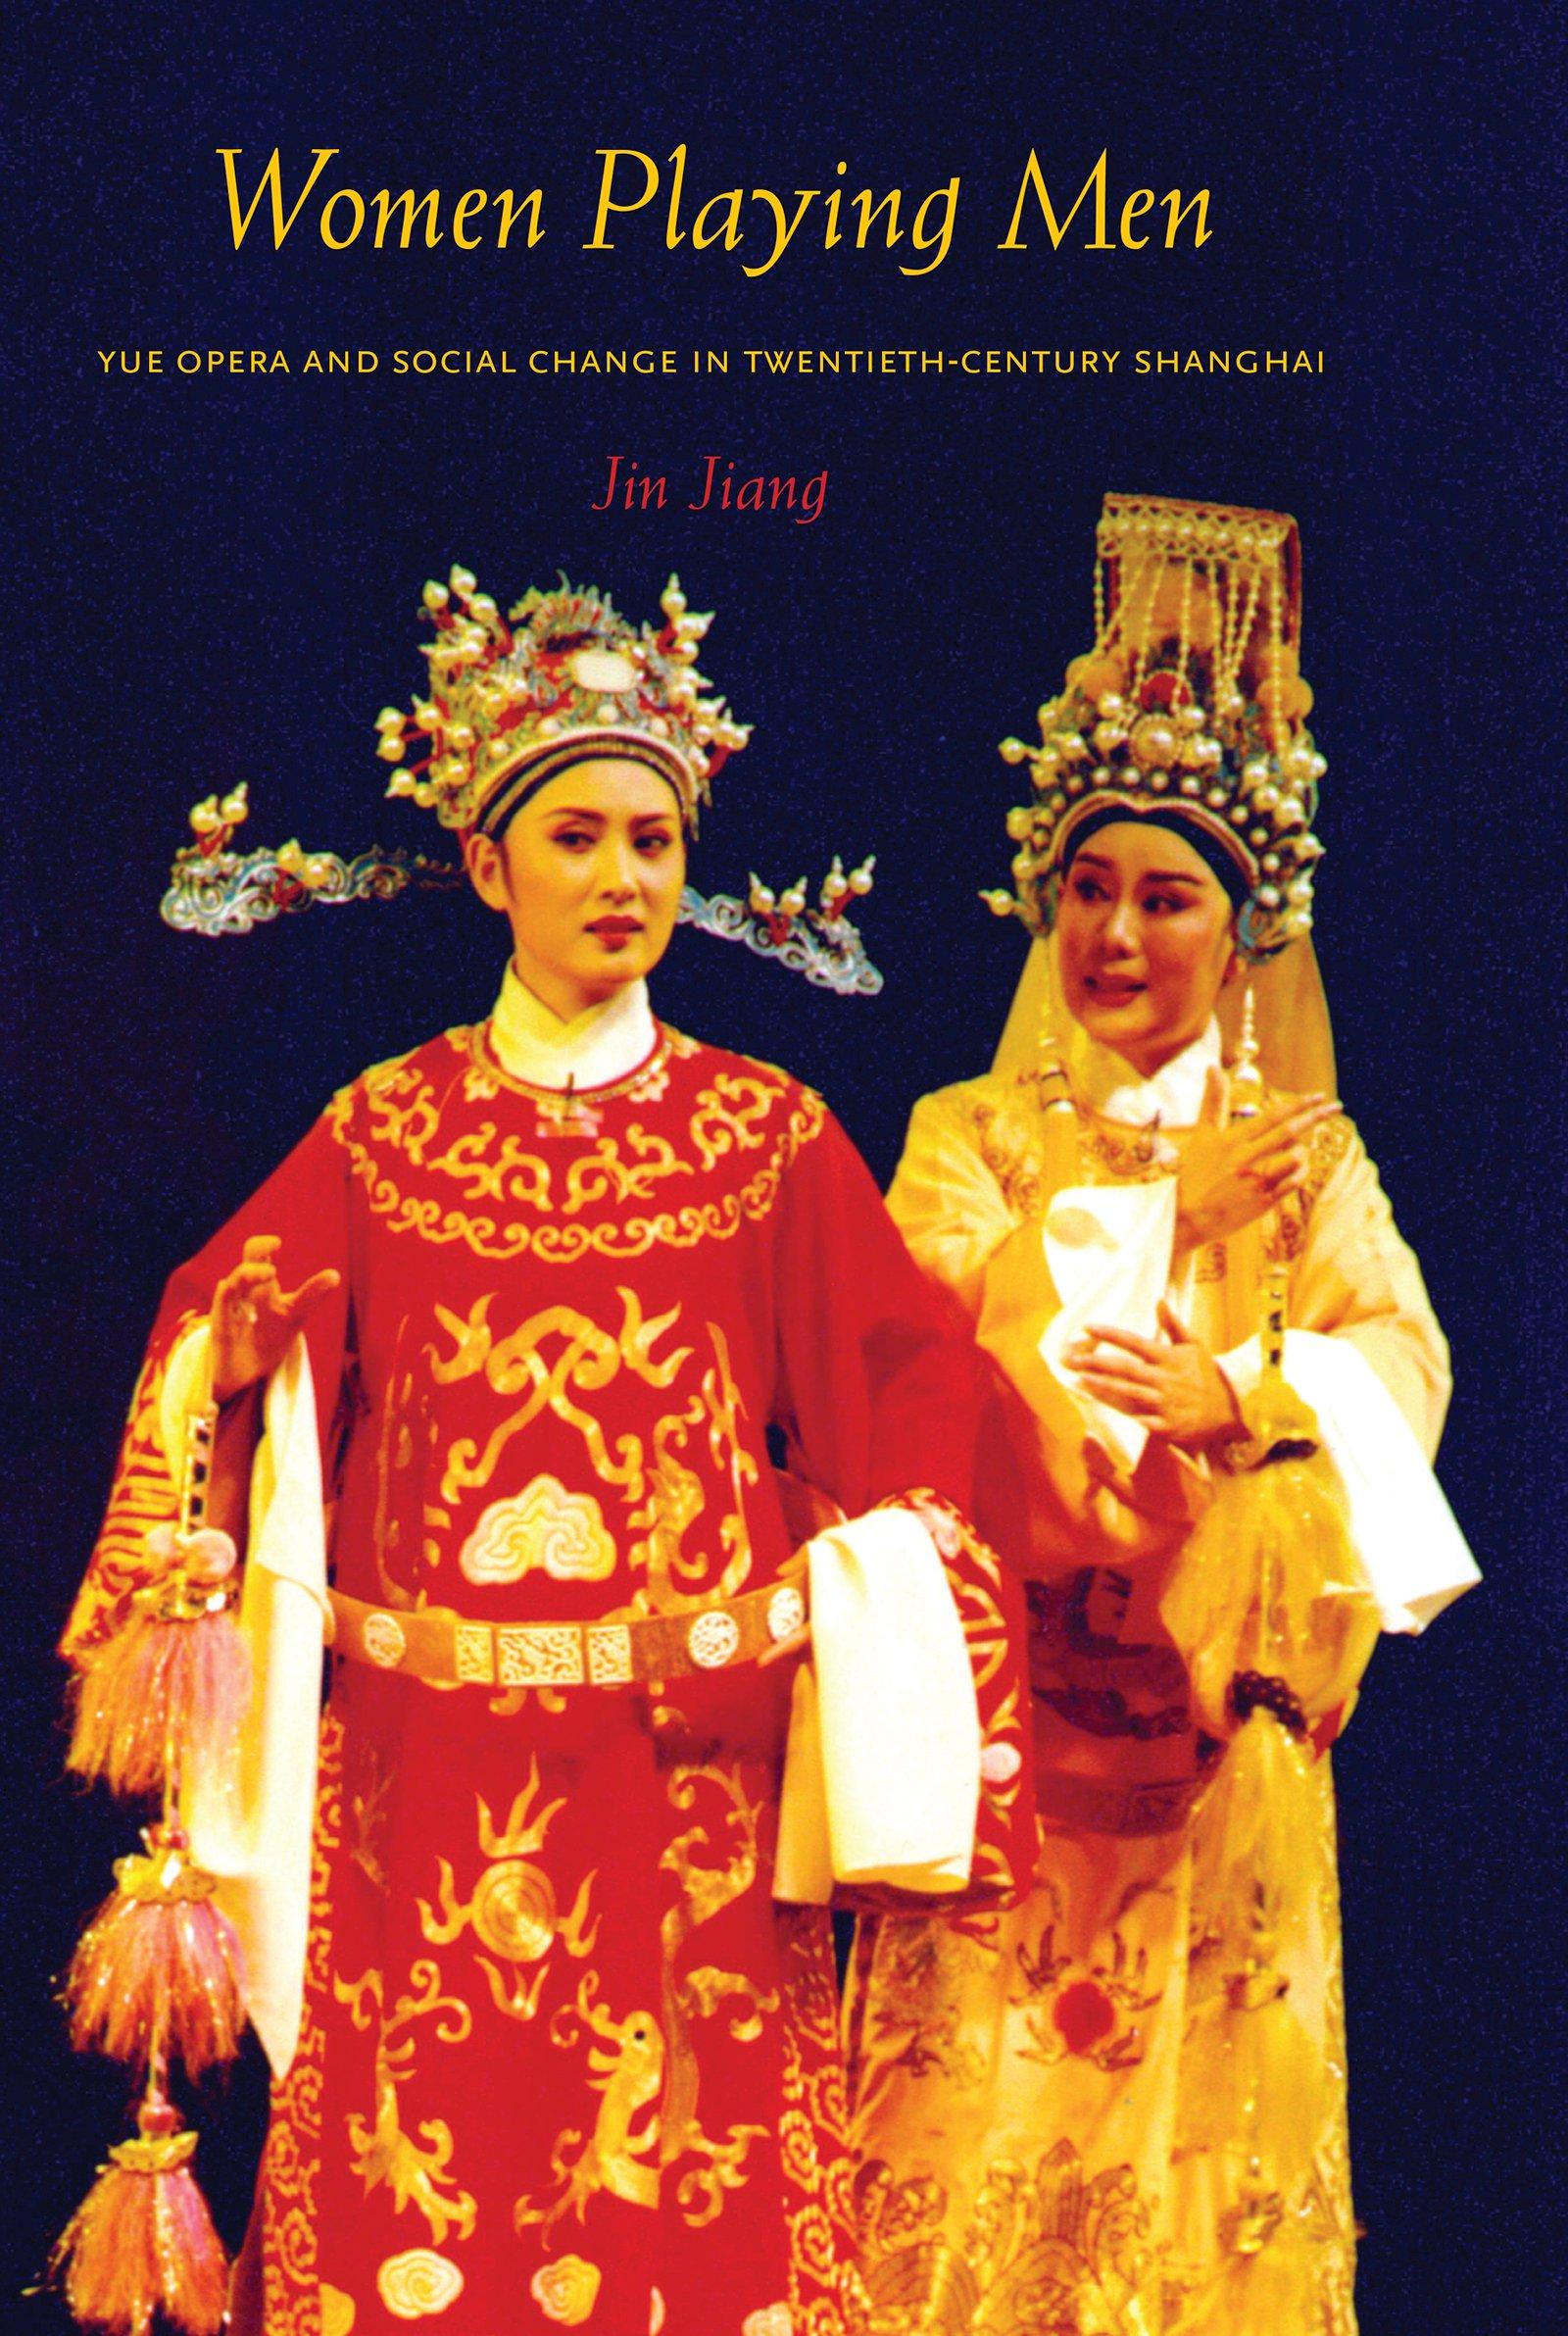 Women Playing Men: Yue Opera and Social Change in Twentieth-Century Shanghai